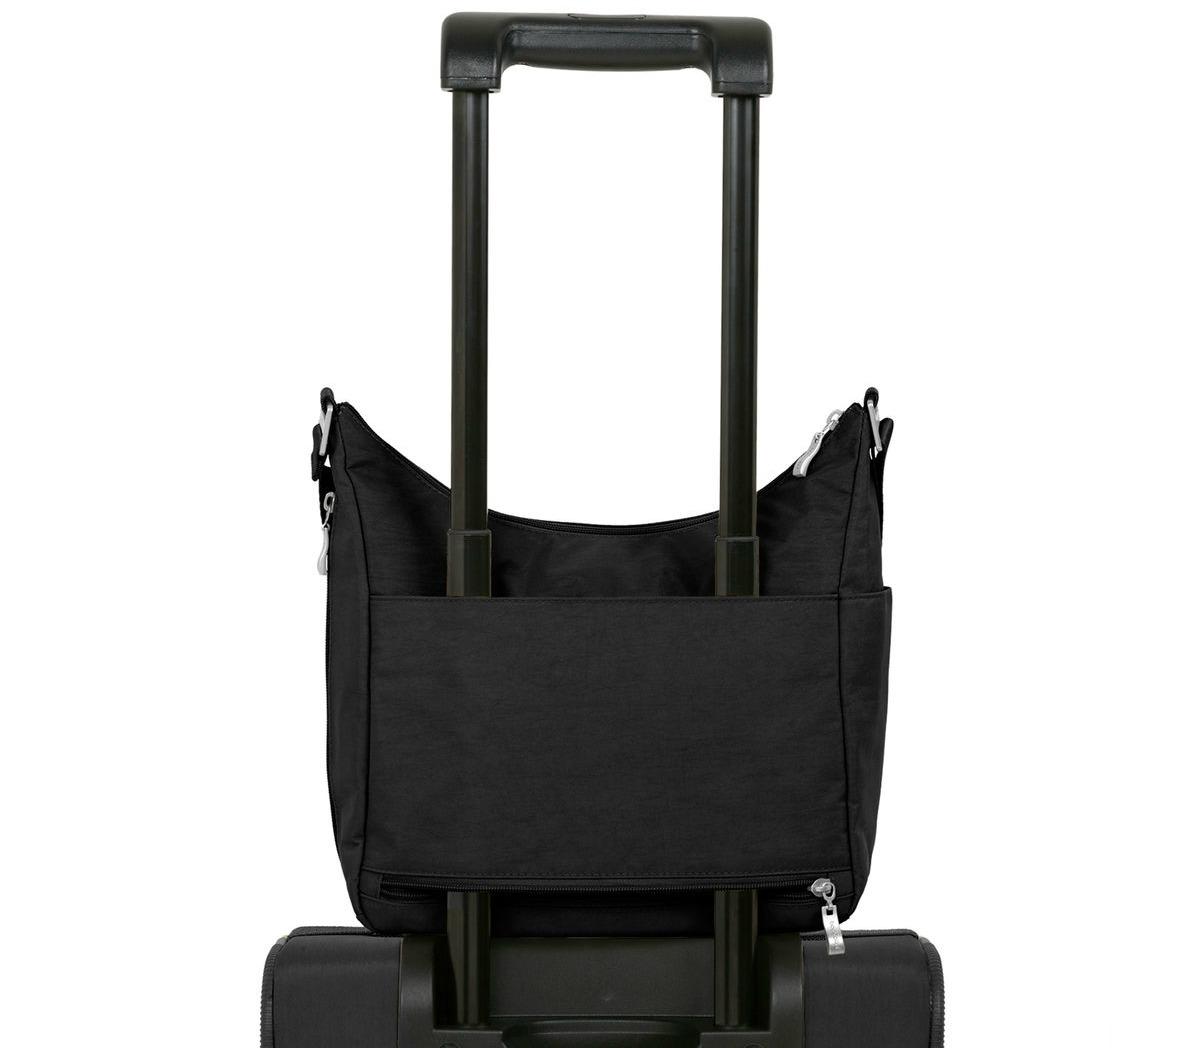 baggallini-purse-review